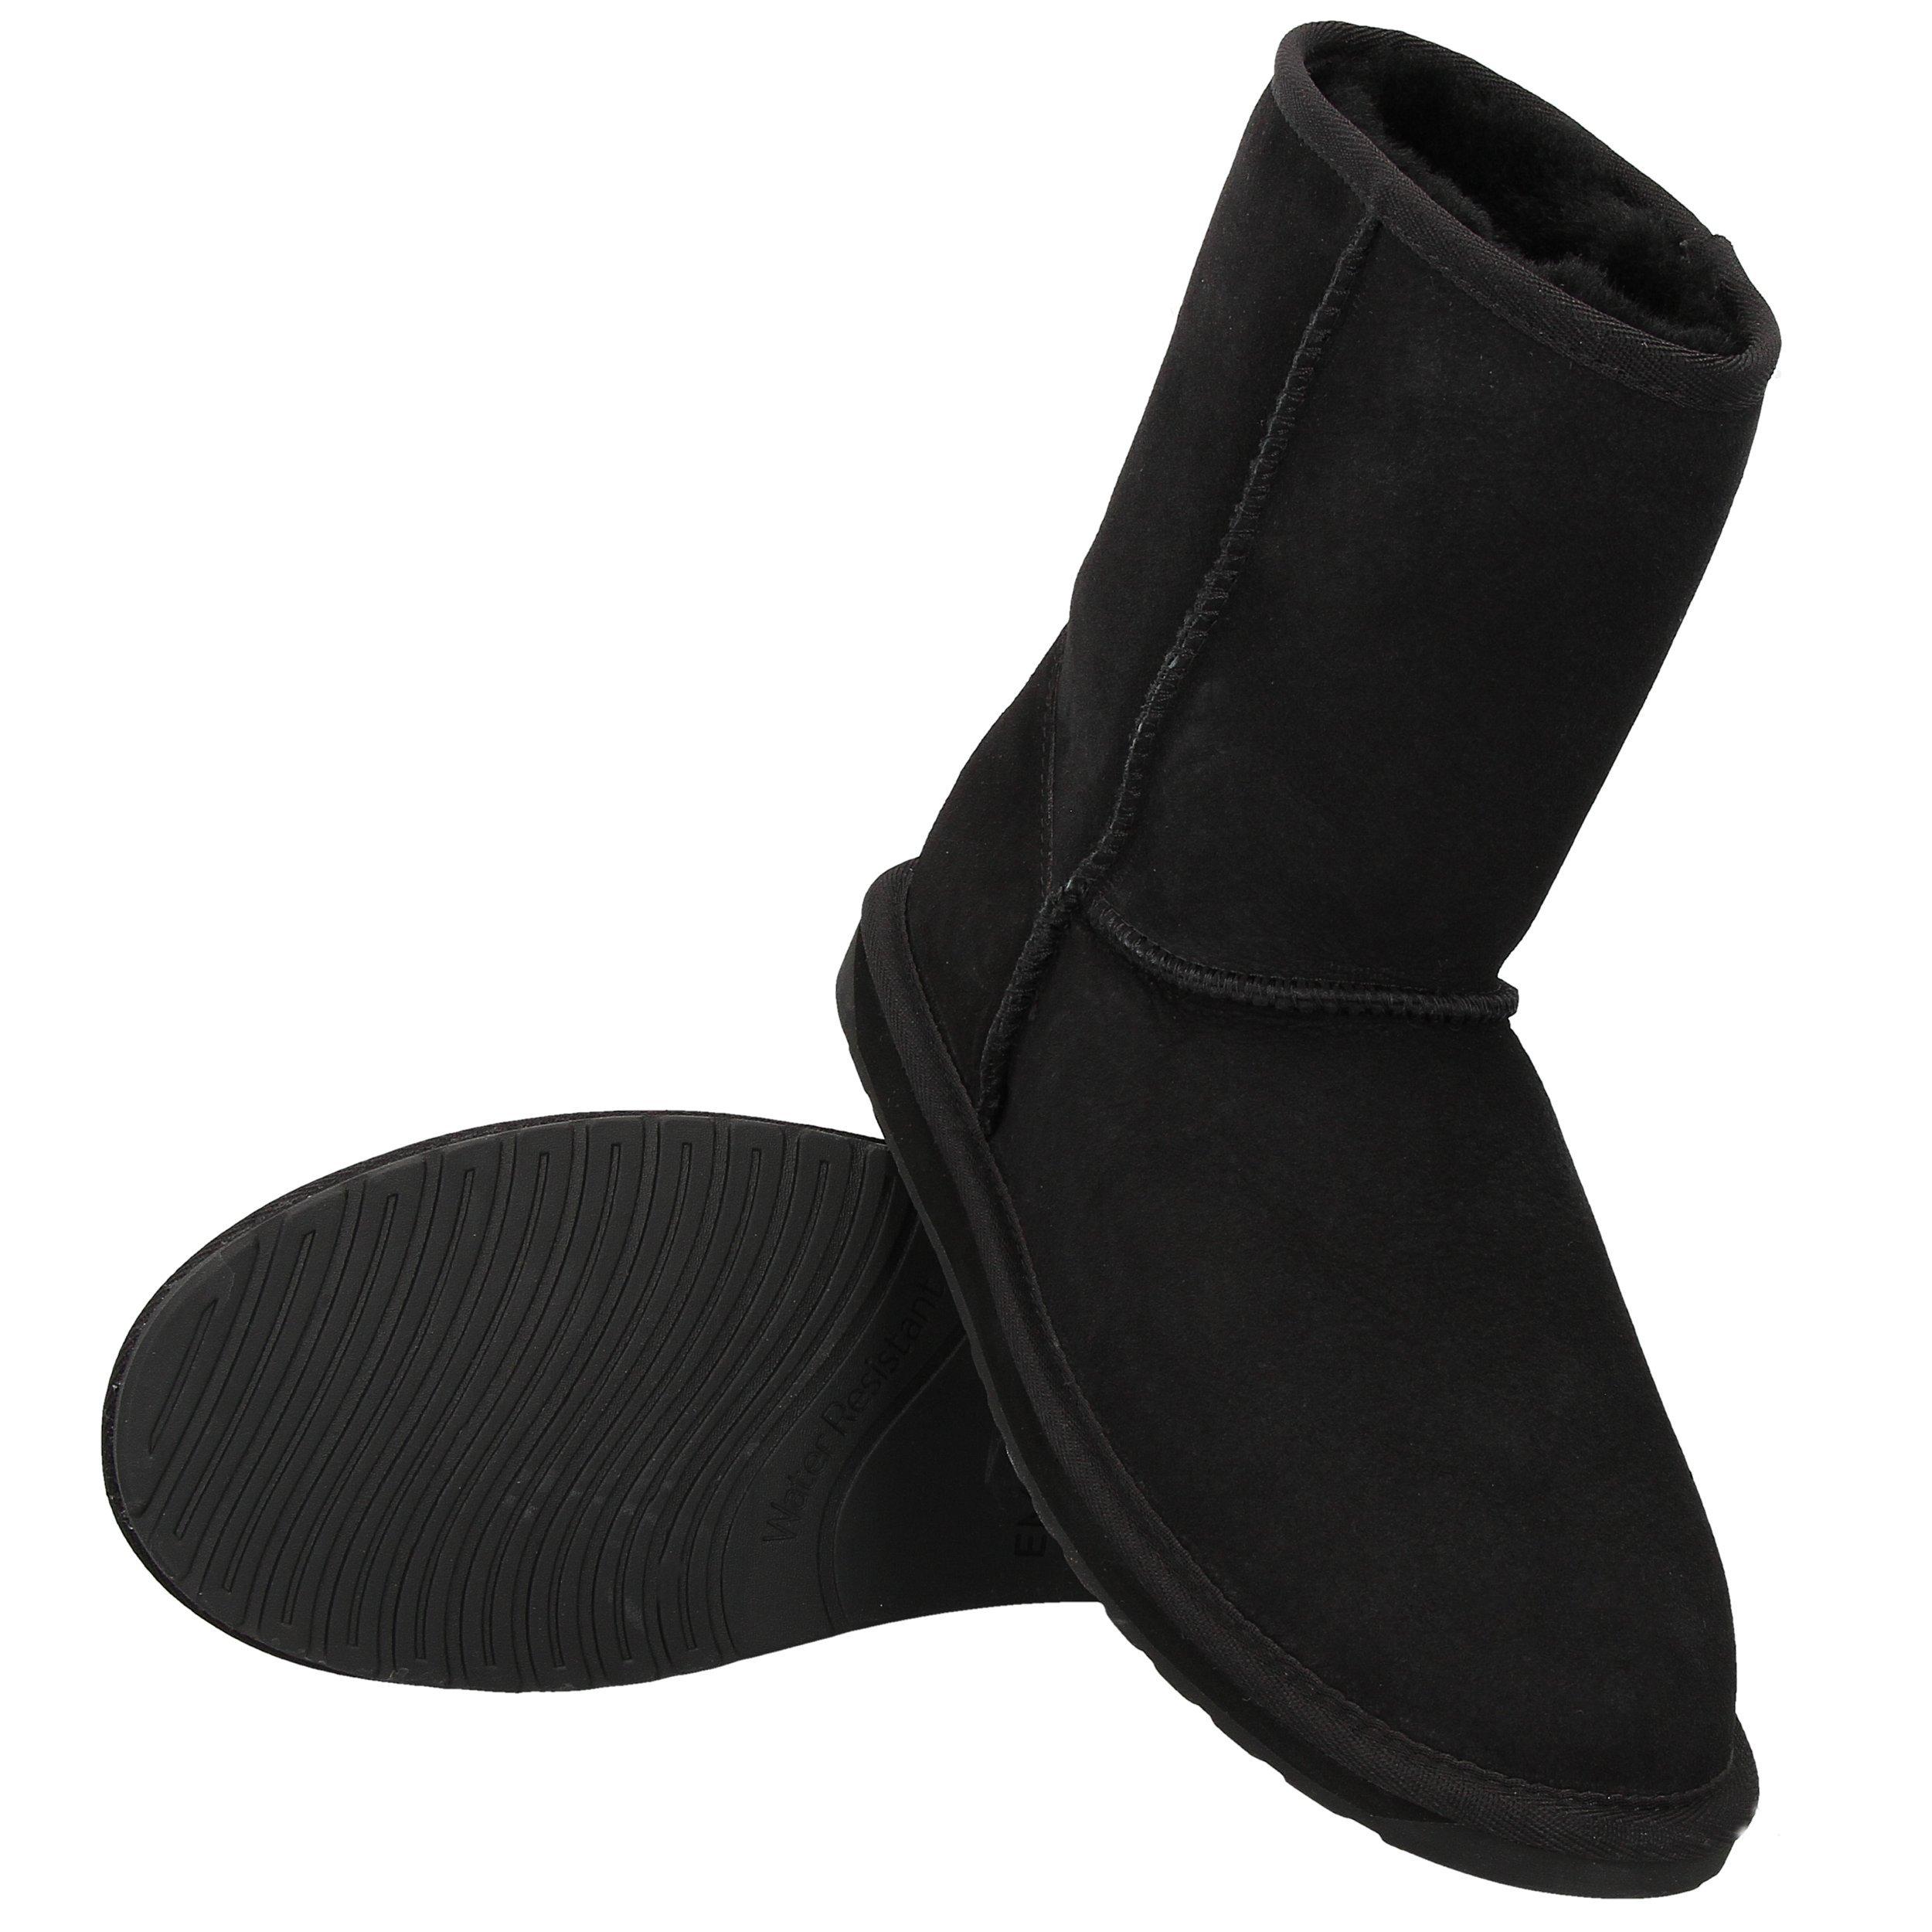 233caa77d2a91 Botki EMU Stinger Lo black buty zimowe czarne r 37 - 7220328706 ...